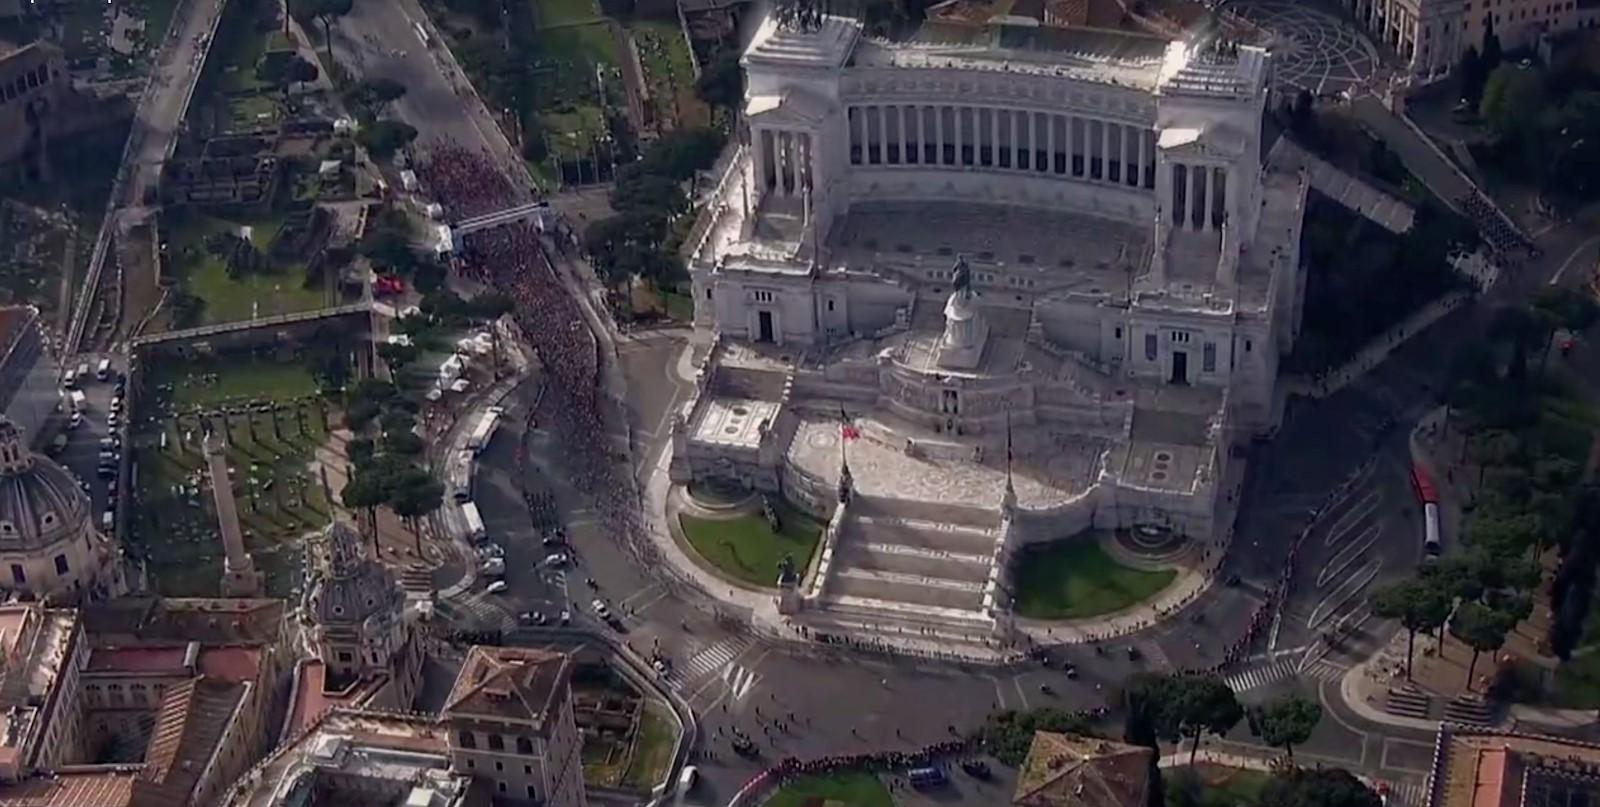 [Хабра-оффтоп] Maratona di Roma, или первый марафон для ИТ-шника - 17